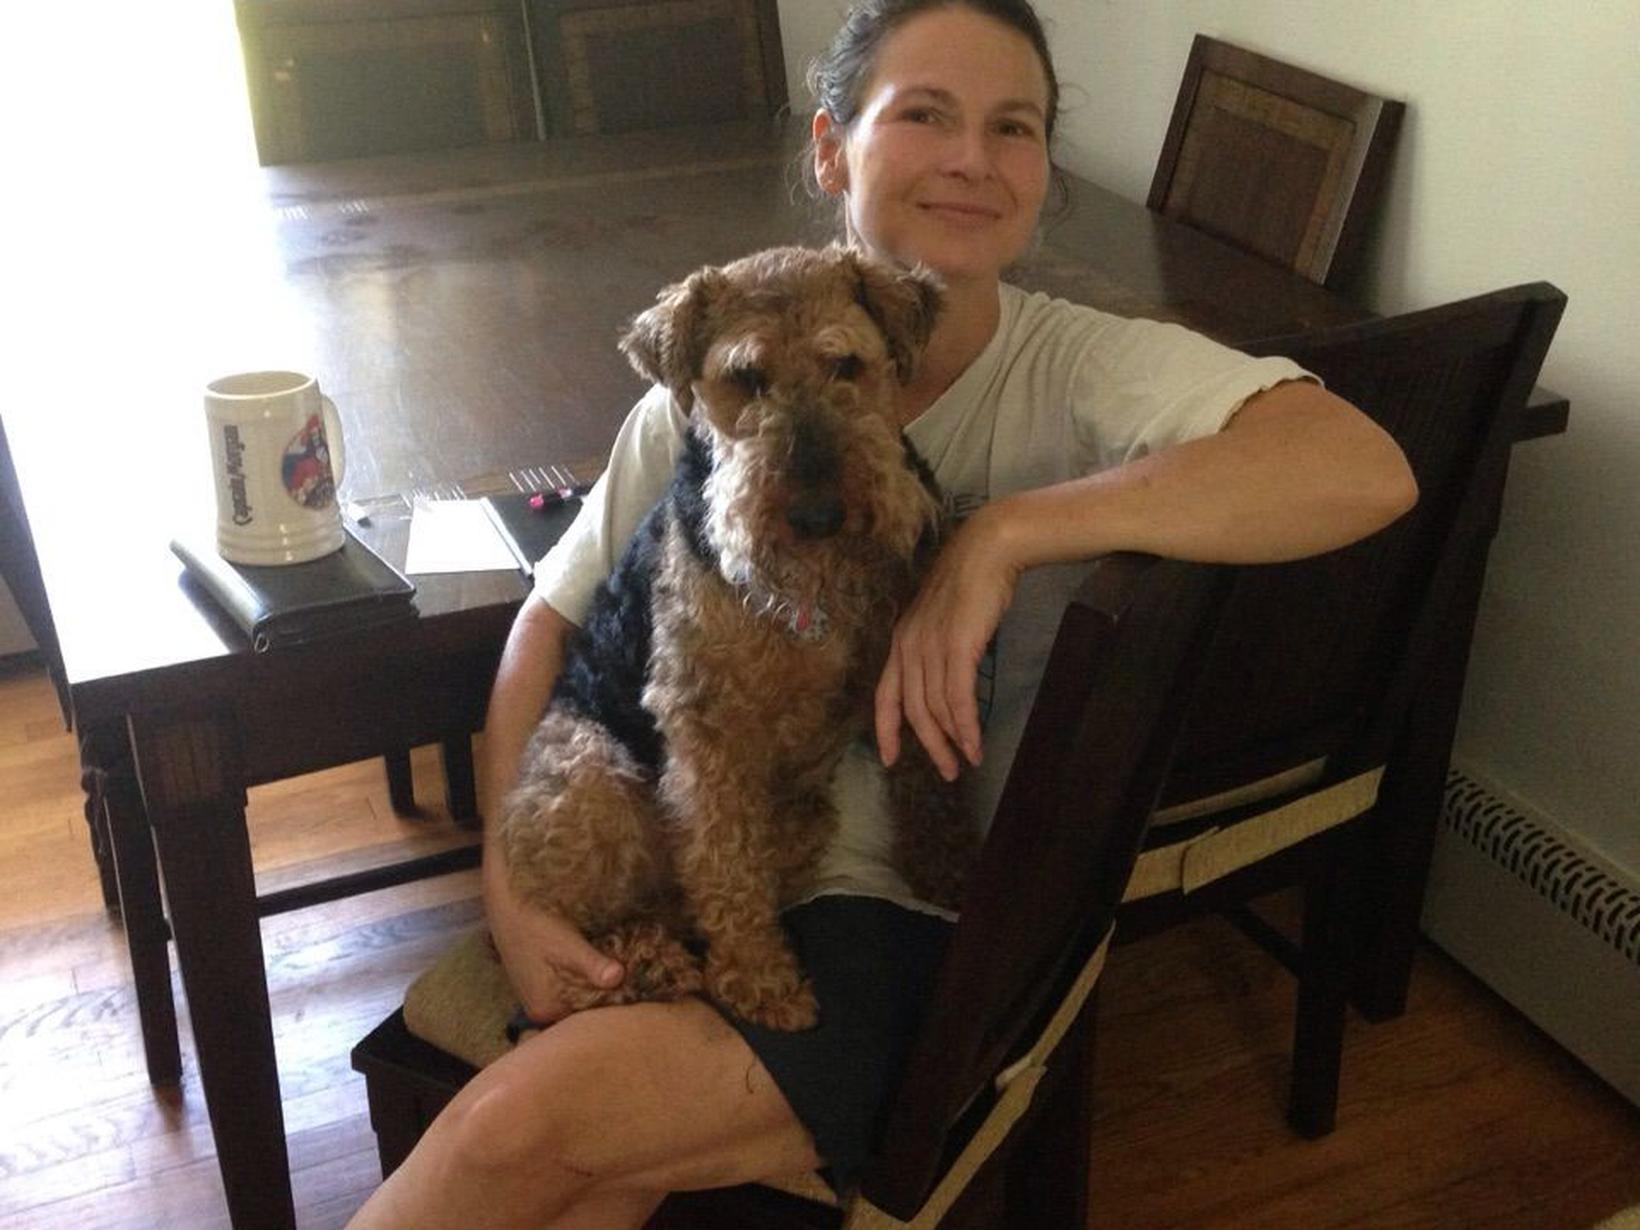 Christy from Manassas, Virginia, United States